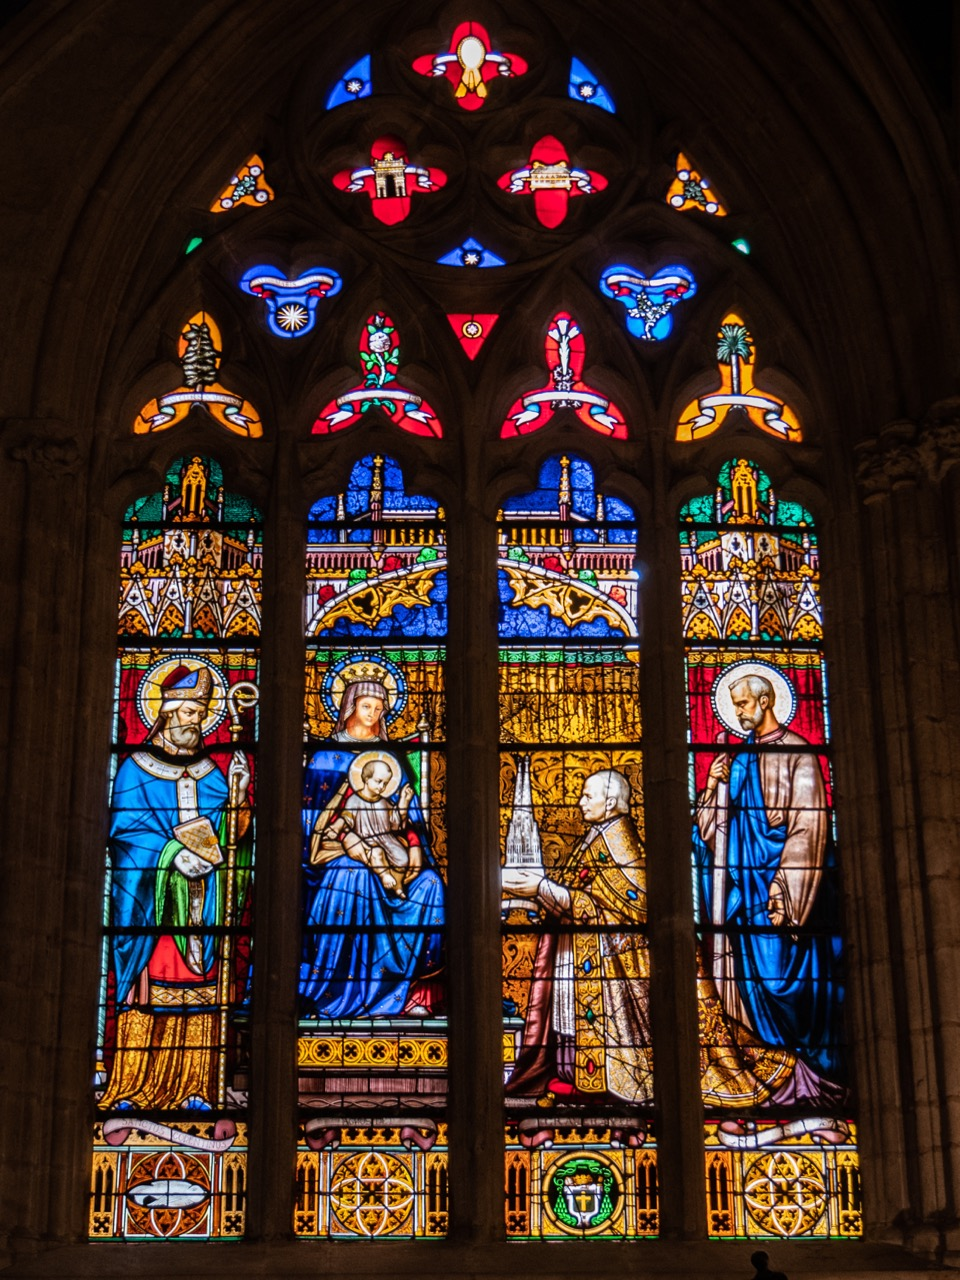 Petruskapelle, Buntglasfenster für Mgr. Graveran, den Erbauer der Turmhelme (Lobin de Tours, 1856)